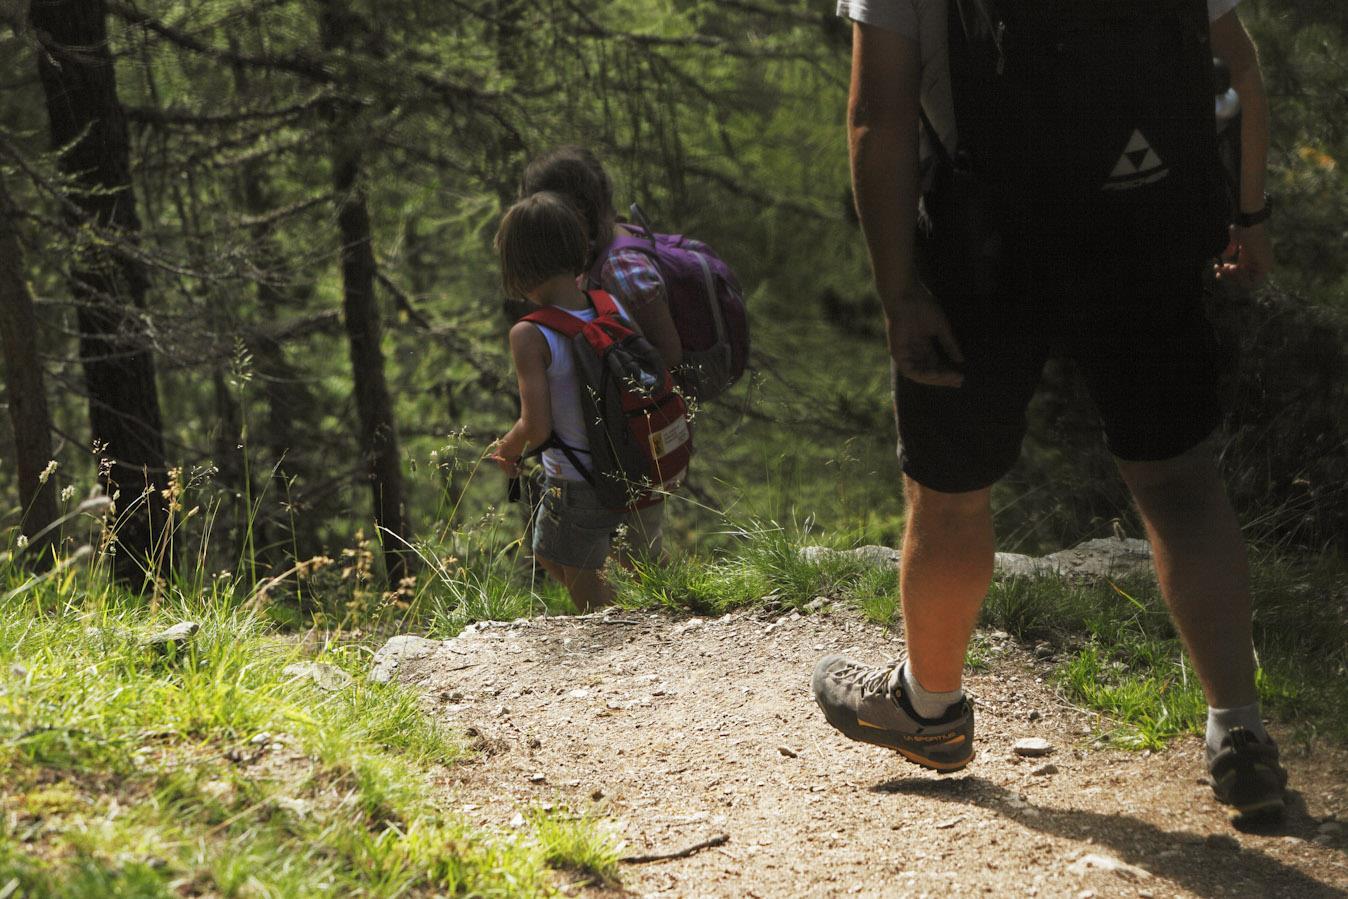 S. Pancrazio Trifterweg Trail